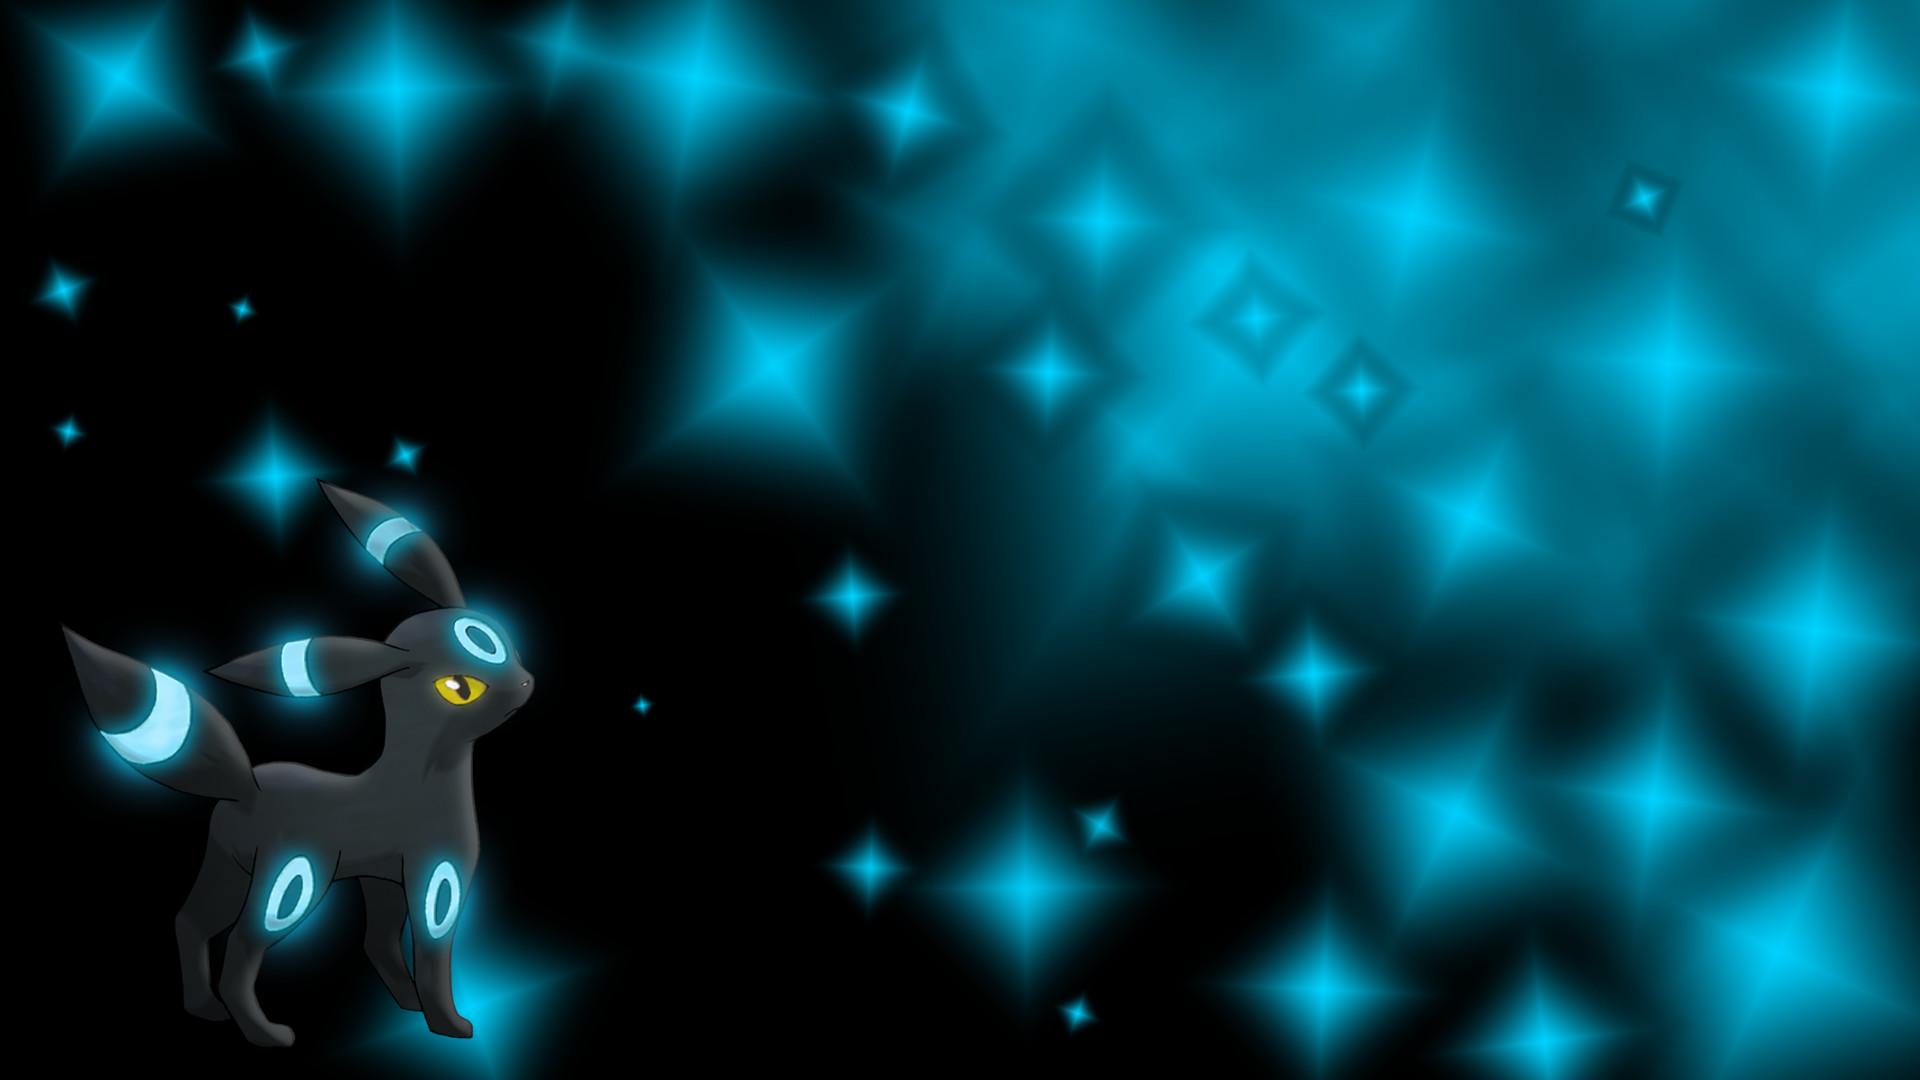 3840x2160 Wallpaper Crescent Moon Light Shiny Neon